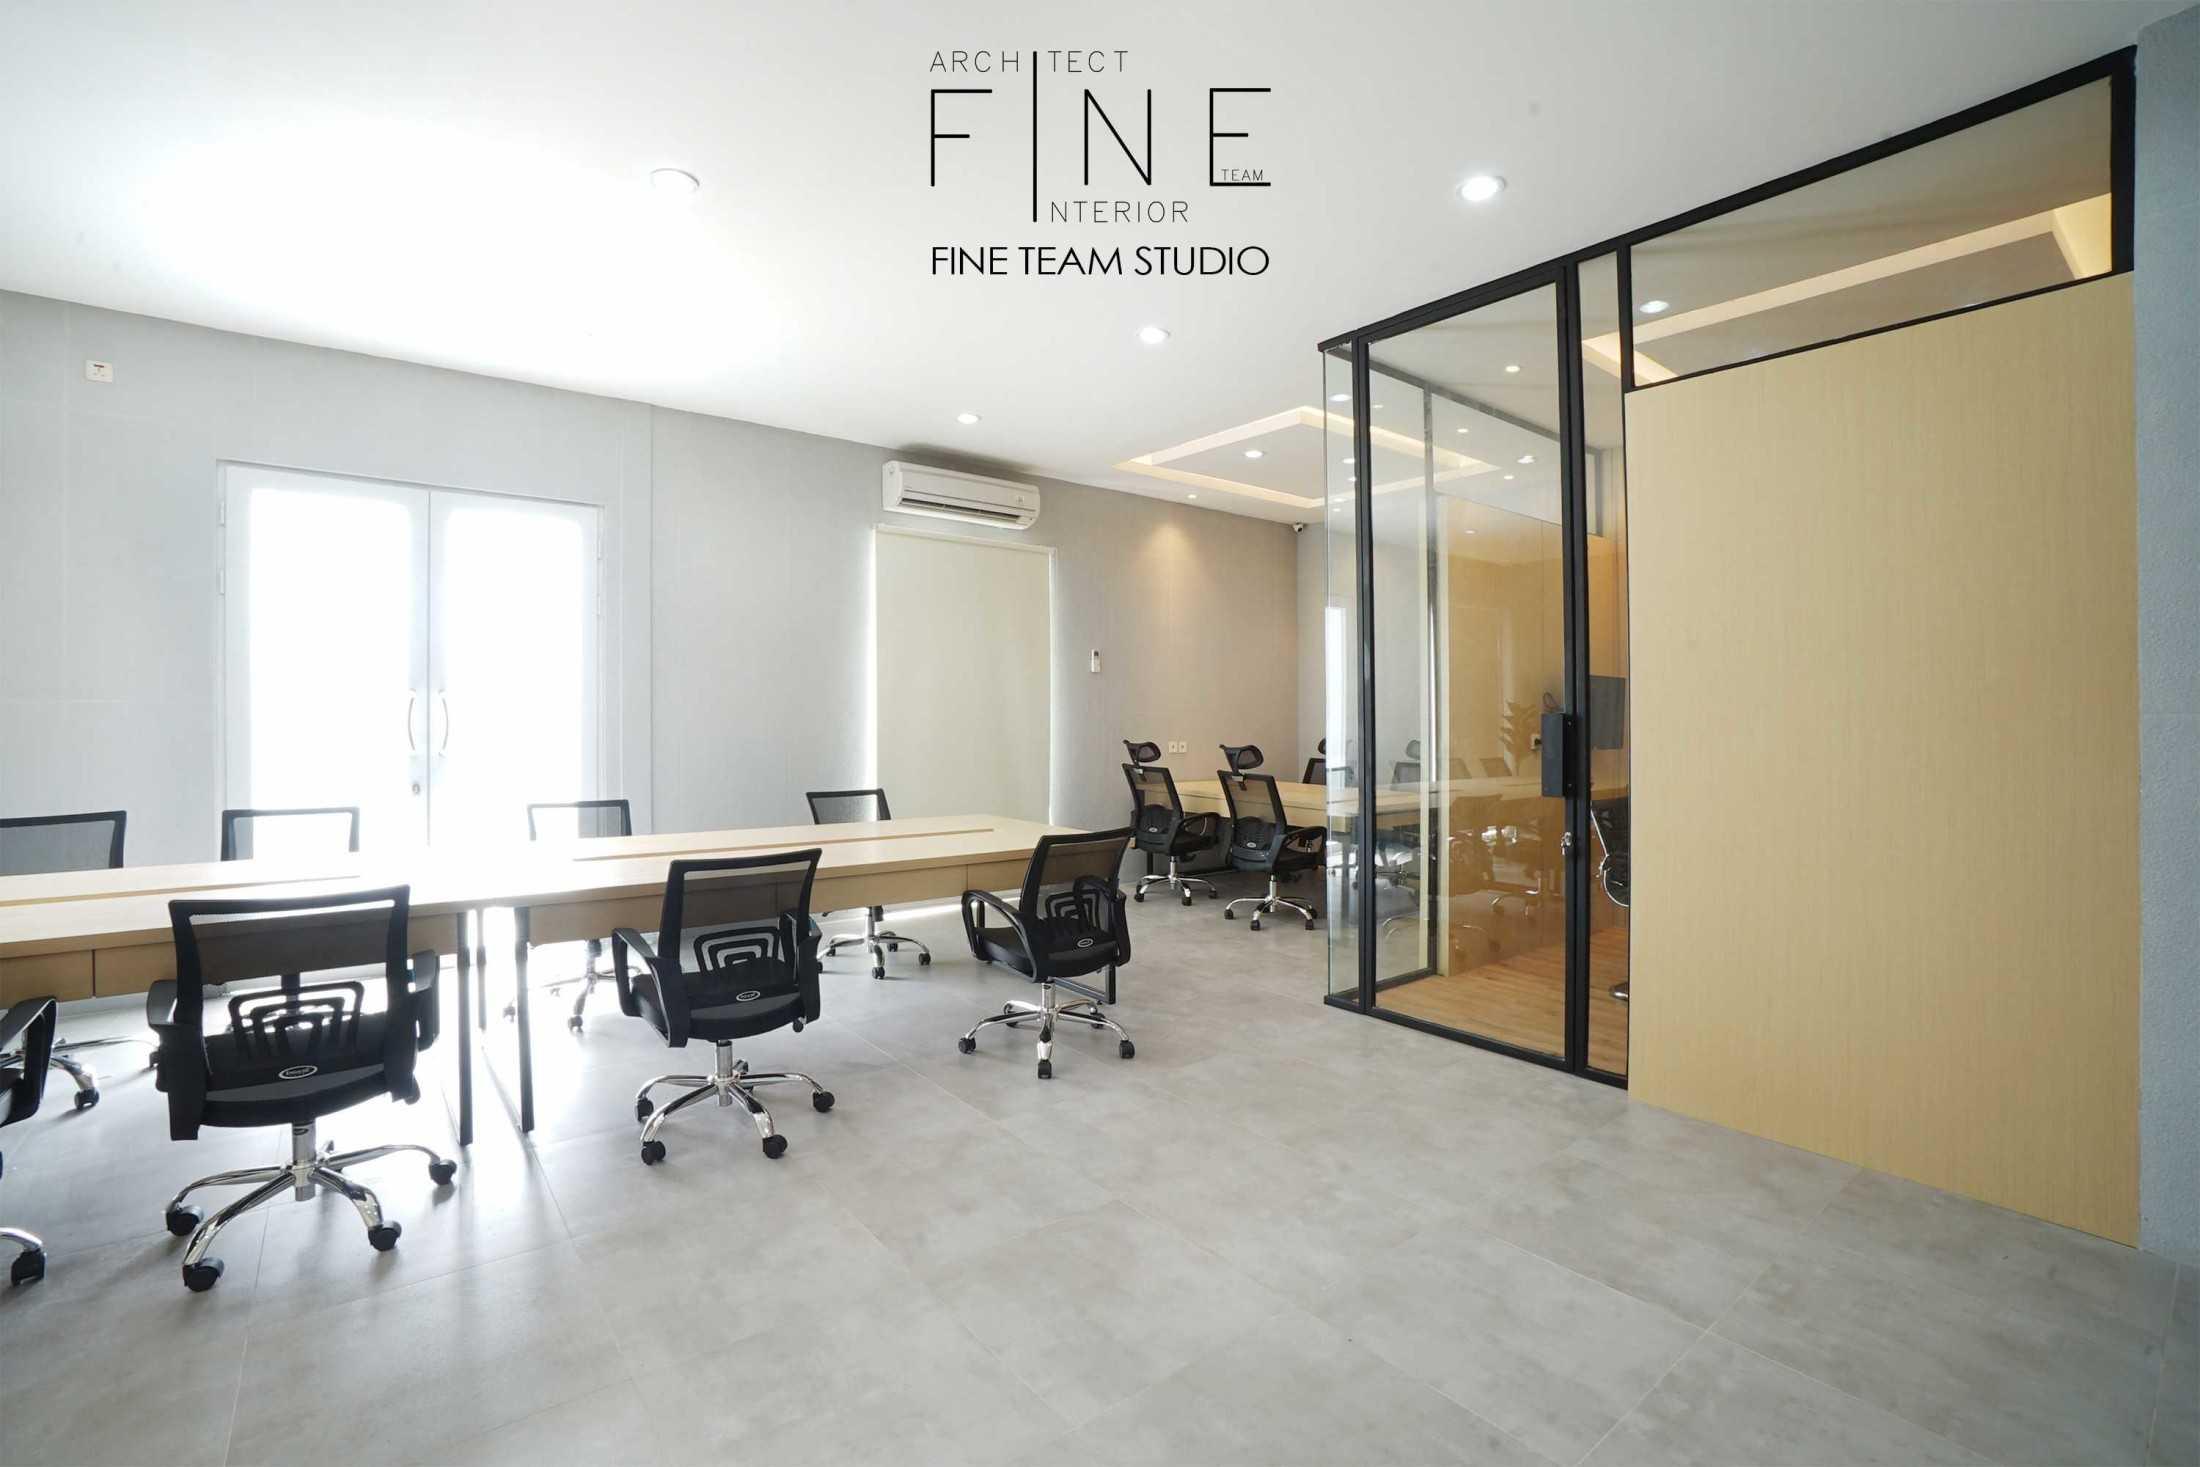 Fine Team Studio Mob Office Cikupa, Tangerang, Banten, Indonesia Cikupa, Tangerang, Banten, Indonesia Fine-Team-Studio-Mob-Office  71126